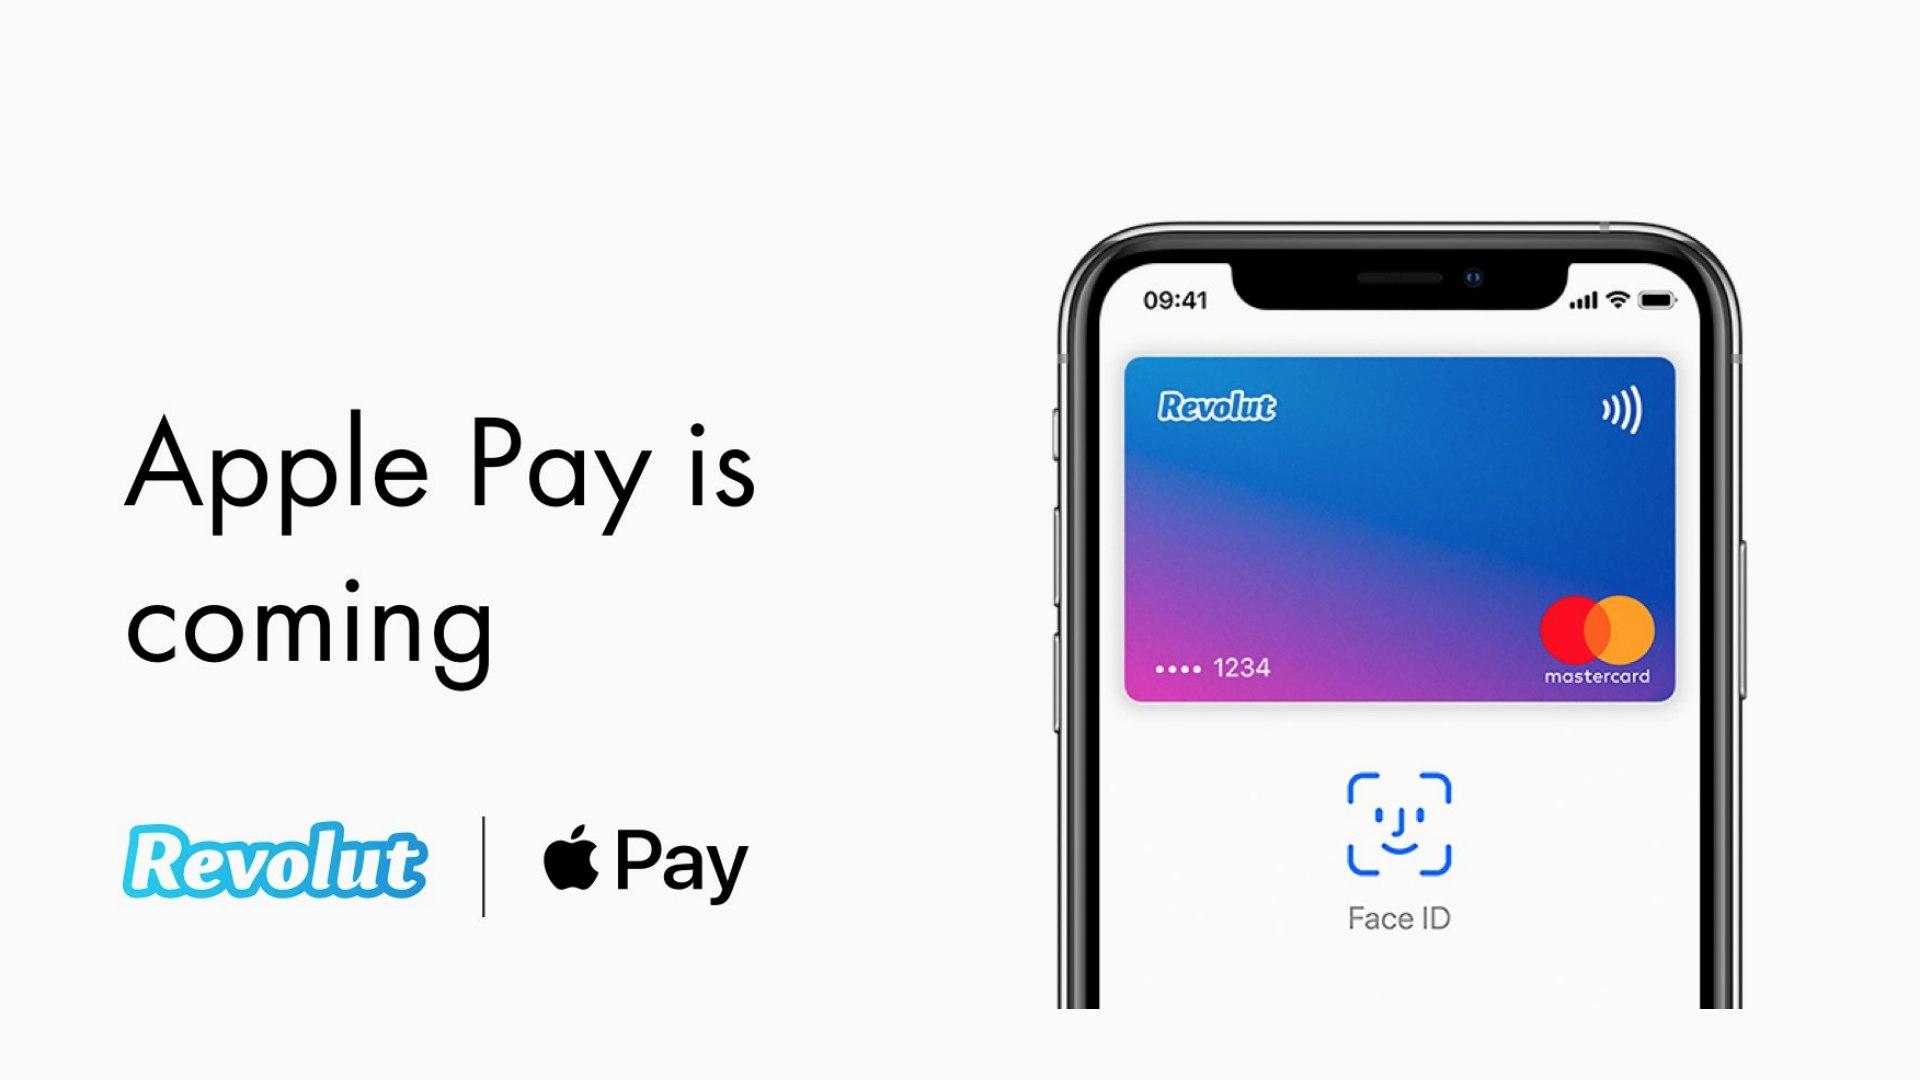 Revolut Apple Pay Google Pay